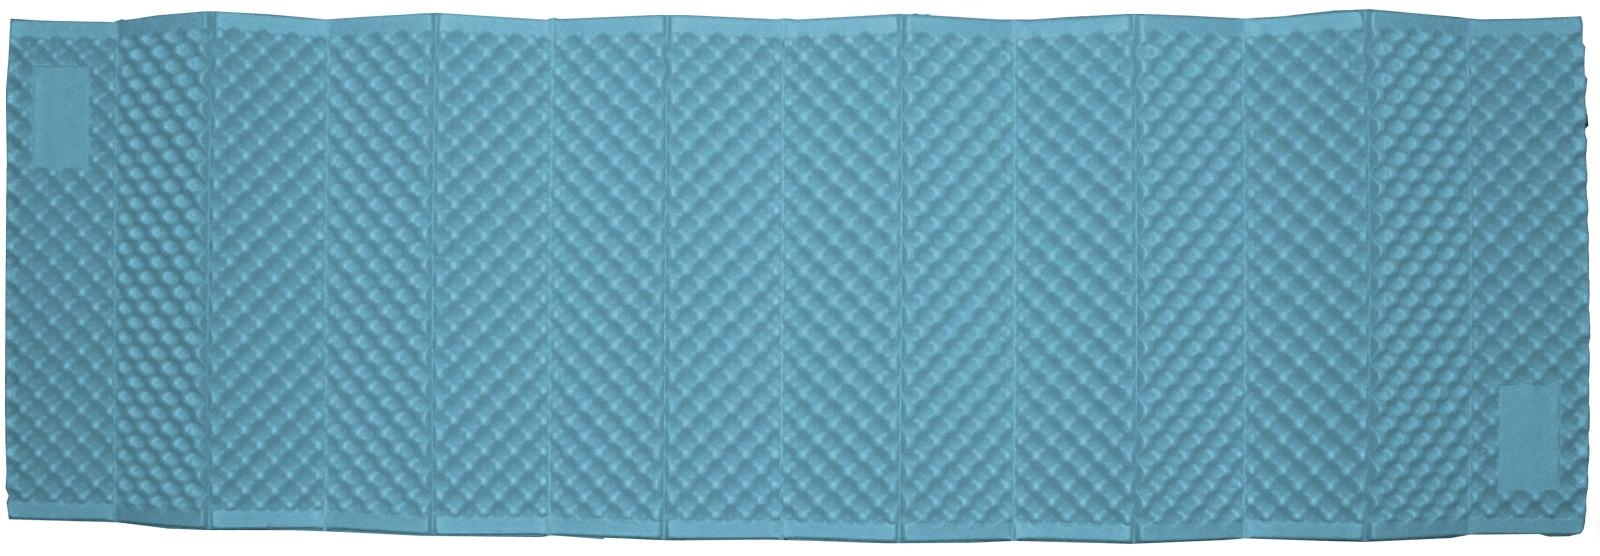 Karimatka  Akord 1,8 modrá